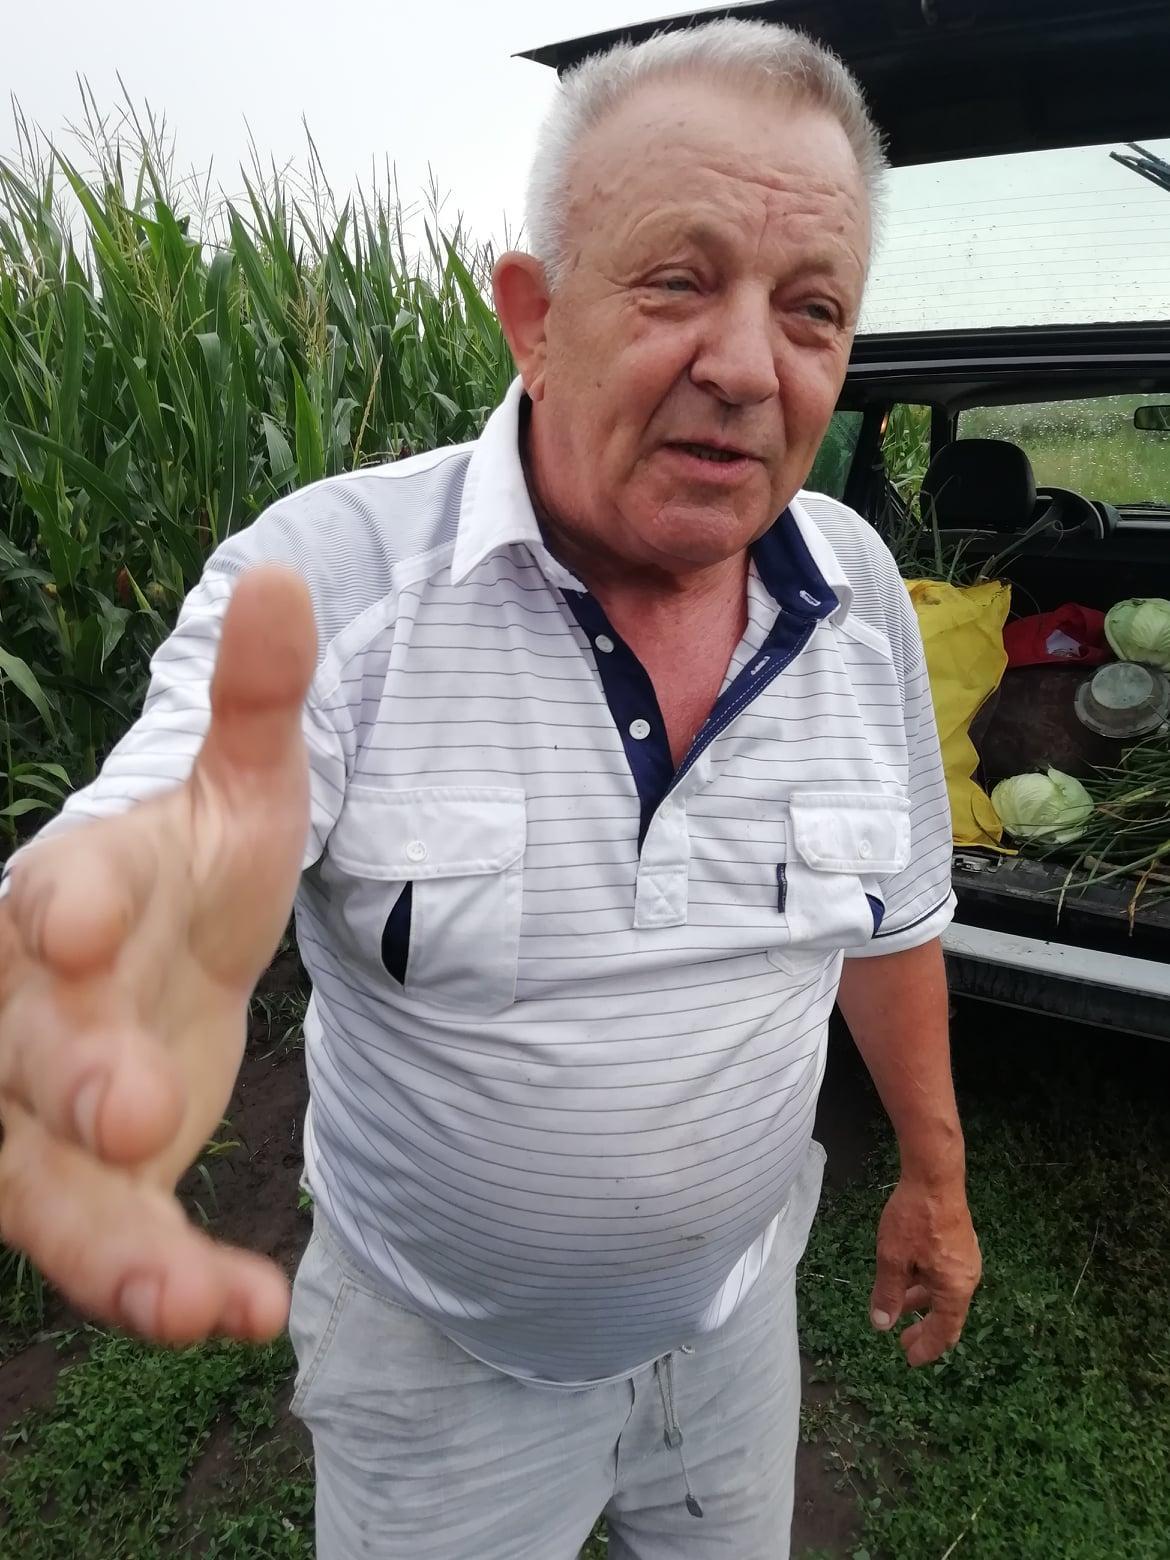 Mykhailo Verbytskyi's car shows cabbage and a bag of vegetables / photo Facebook / Roman Kotsyubovych